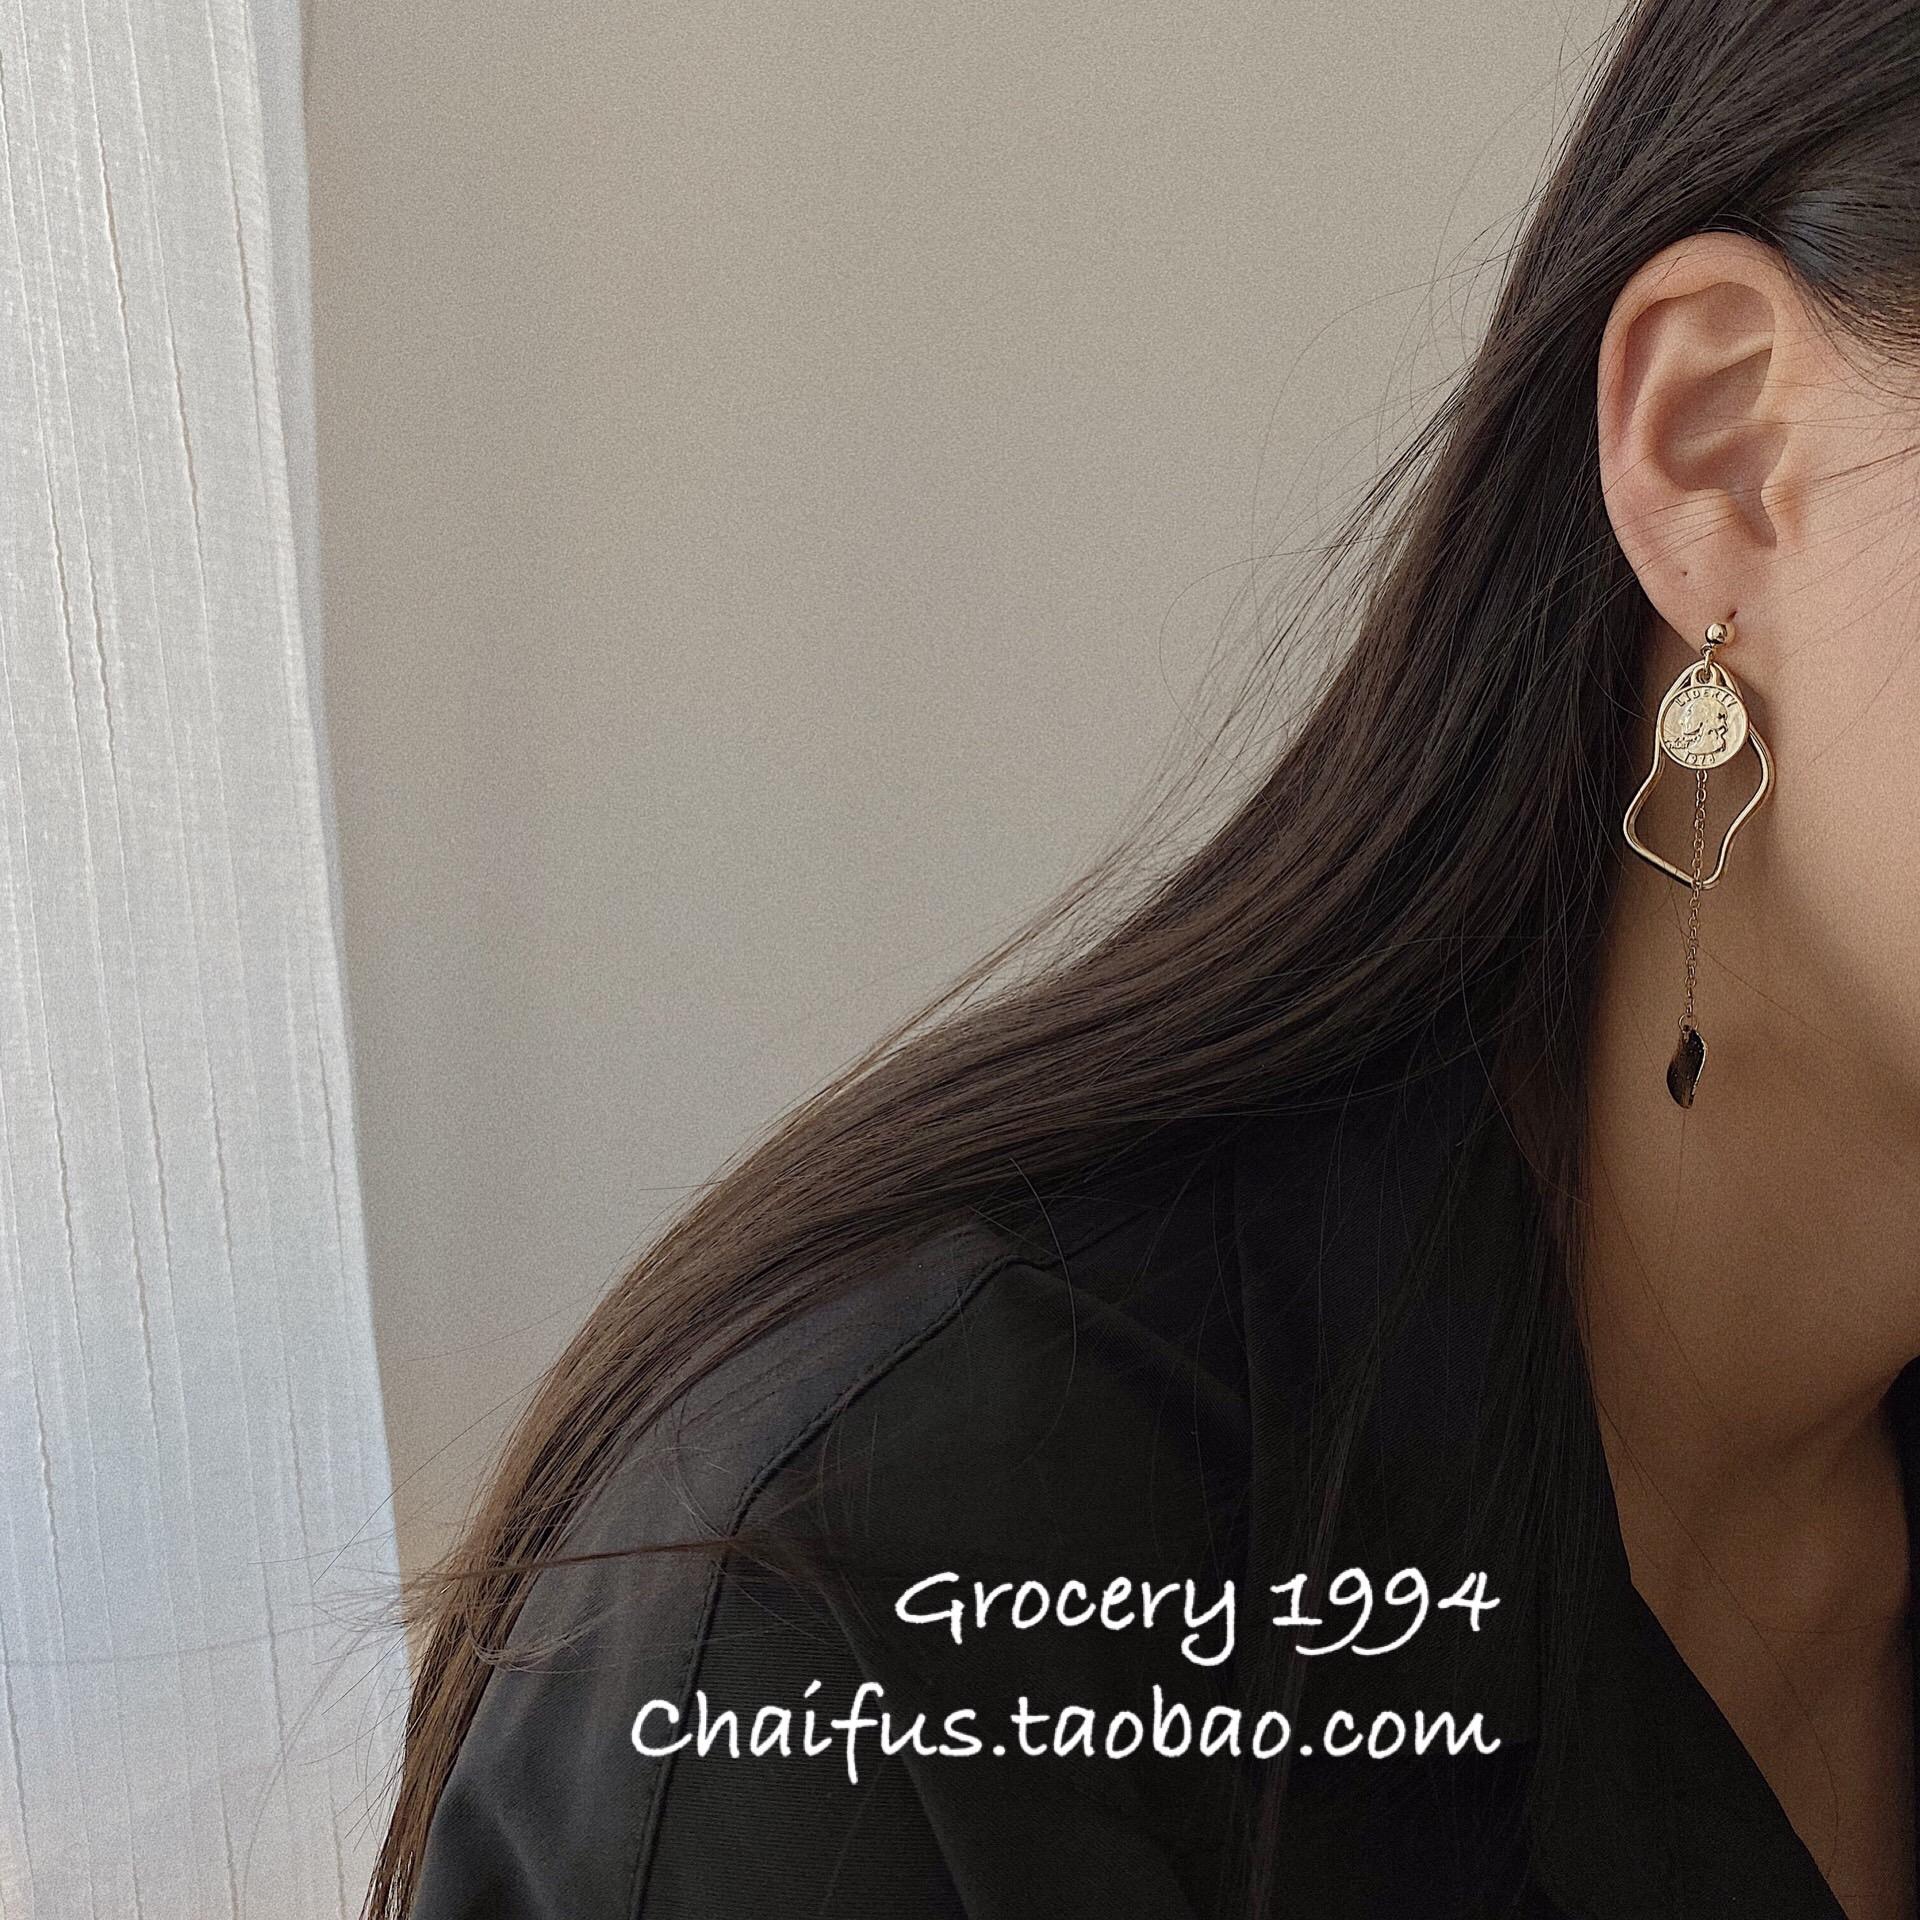 Chaifu studio /E35 INS风简约硬币设计感长款耳环吊坠气质显瘦小